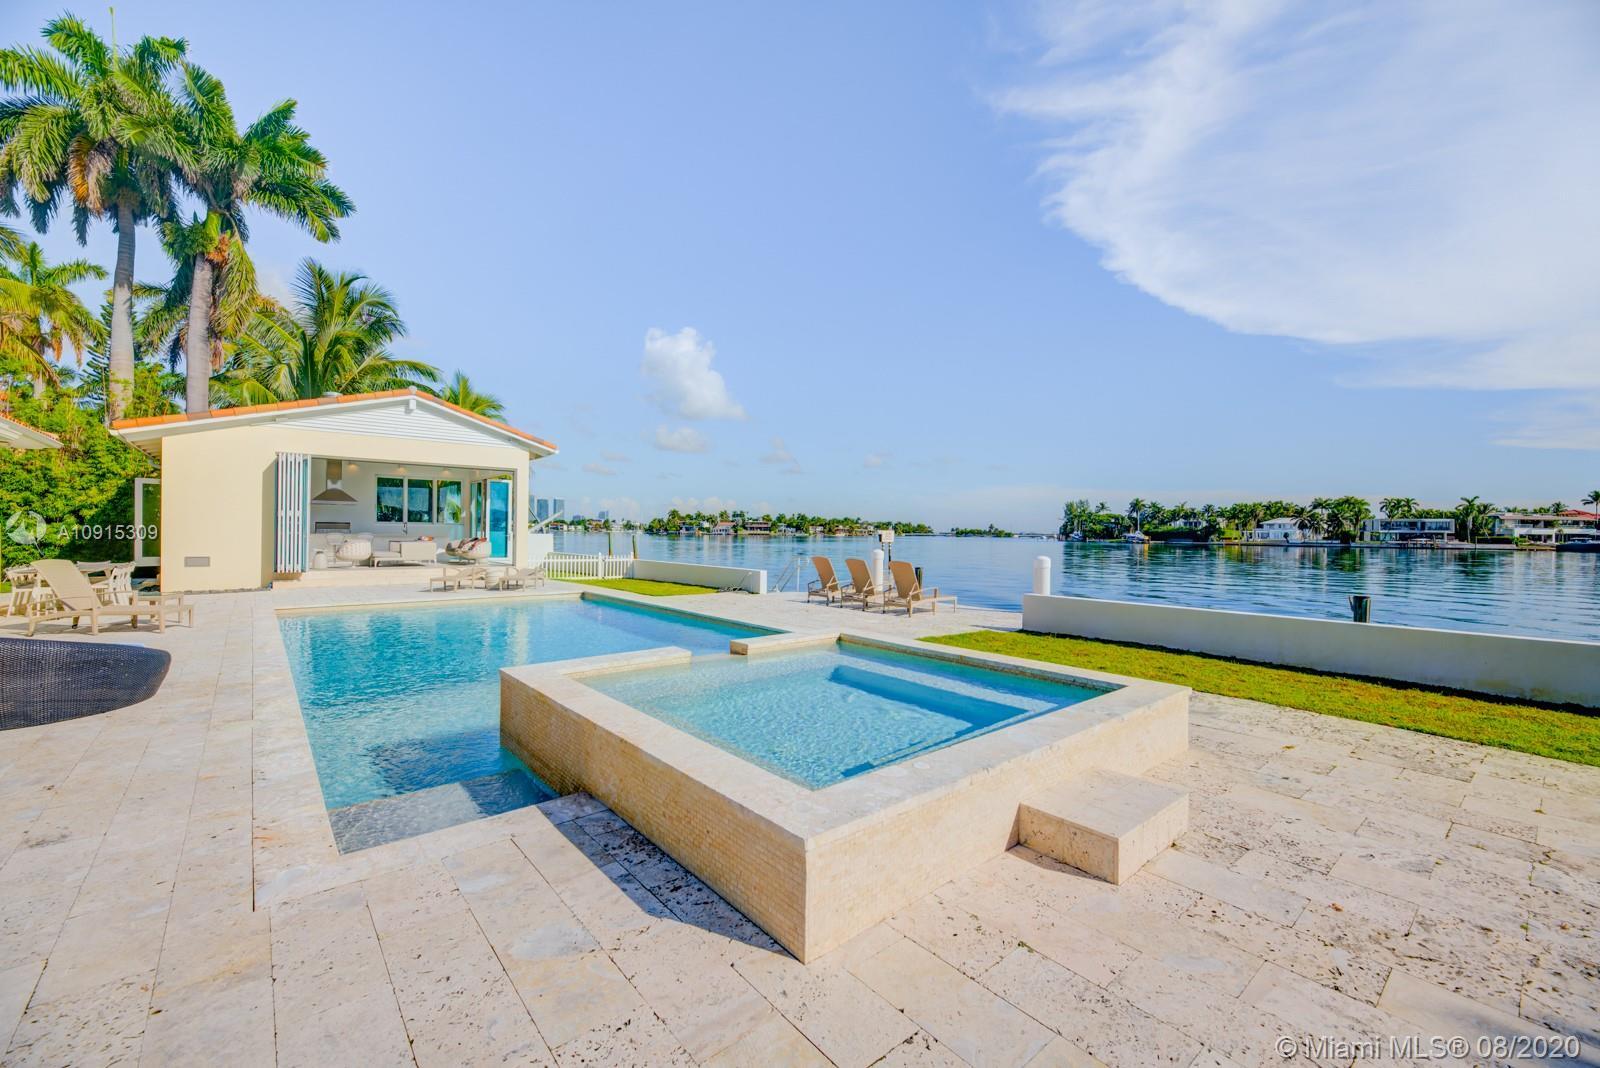 205 N Hibiscus Dr Luxury Real Estate